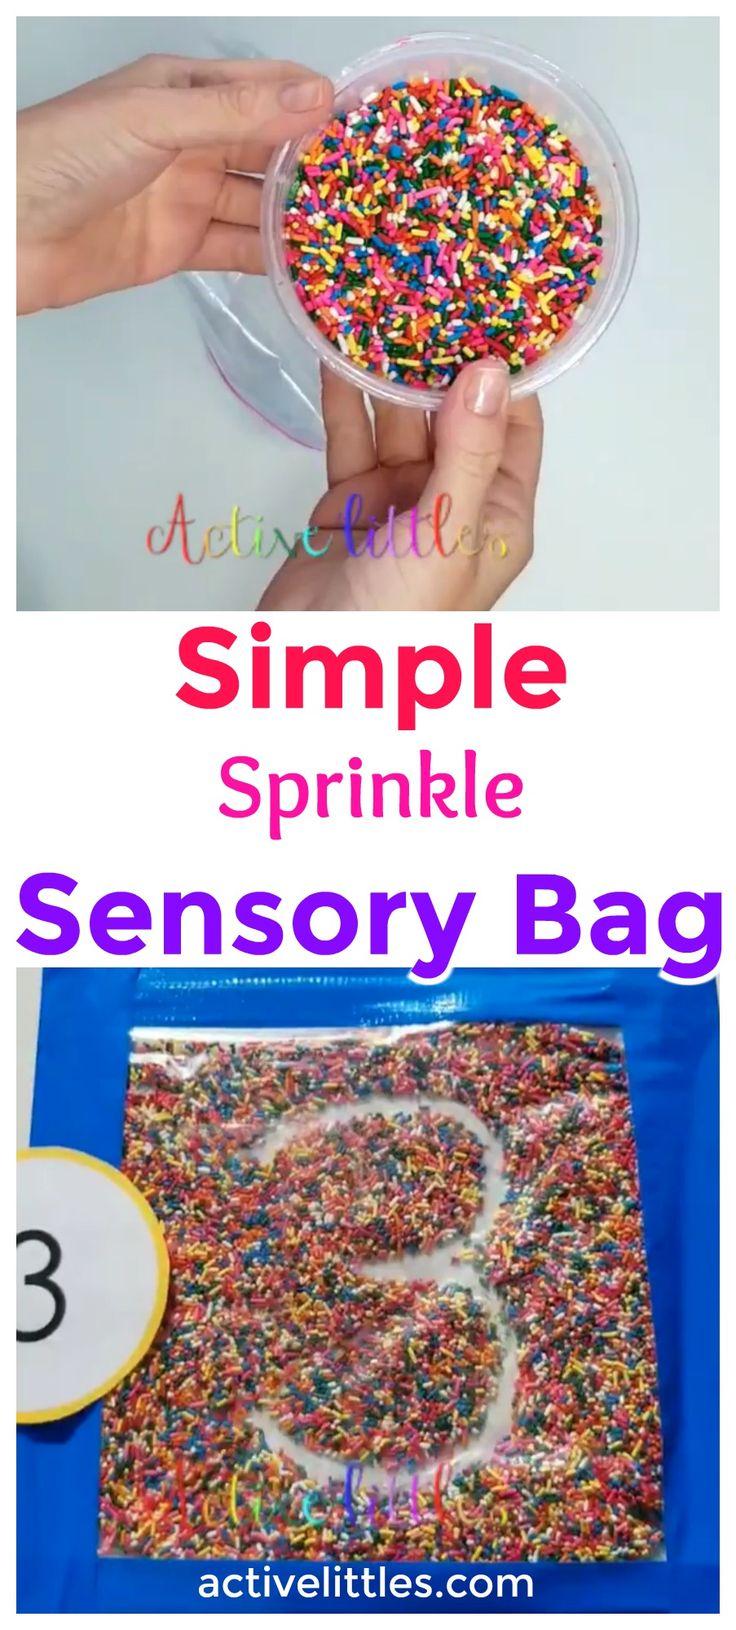 Simple Sprinkle Sensory Bag – Active Littles 4 Year Olds